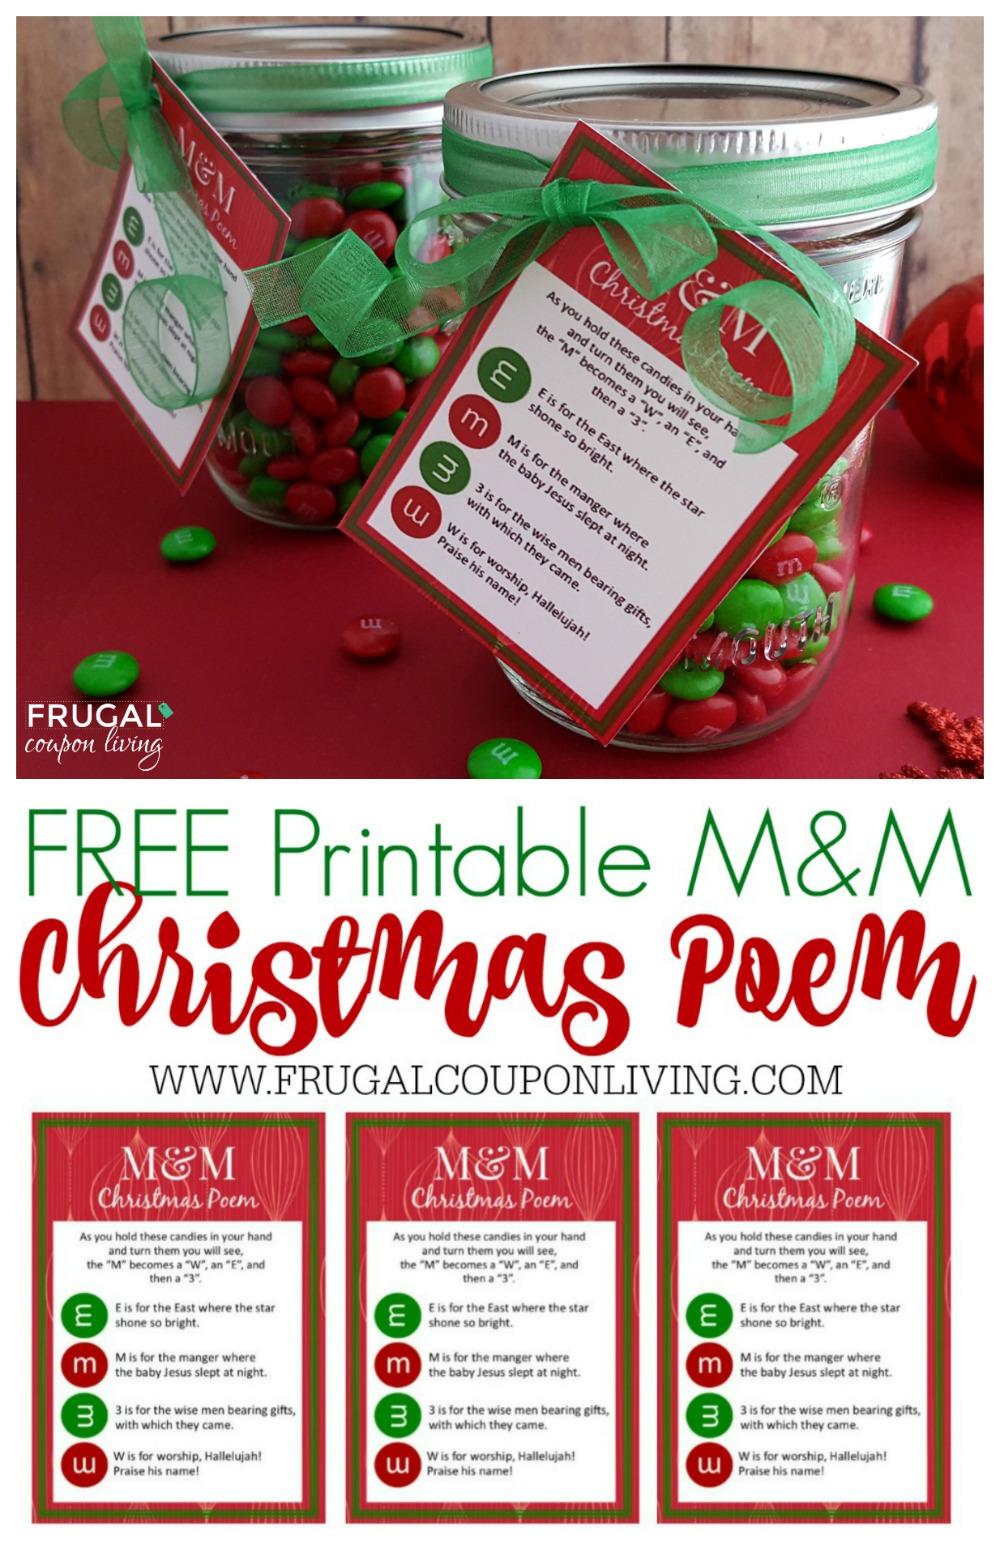 M&M-christmas-poem-free-printable-Frugal-Coupon-living